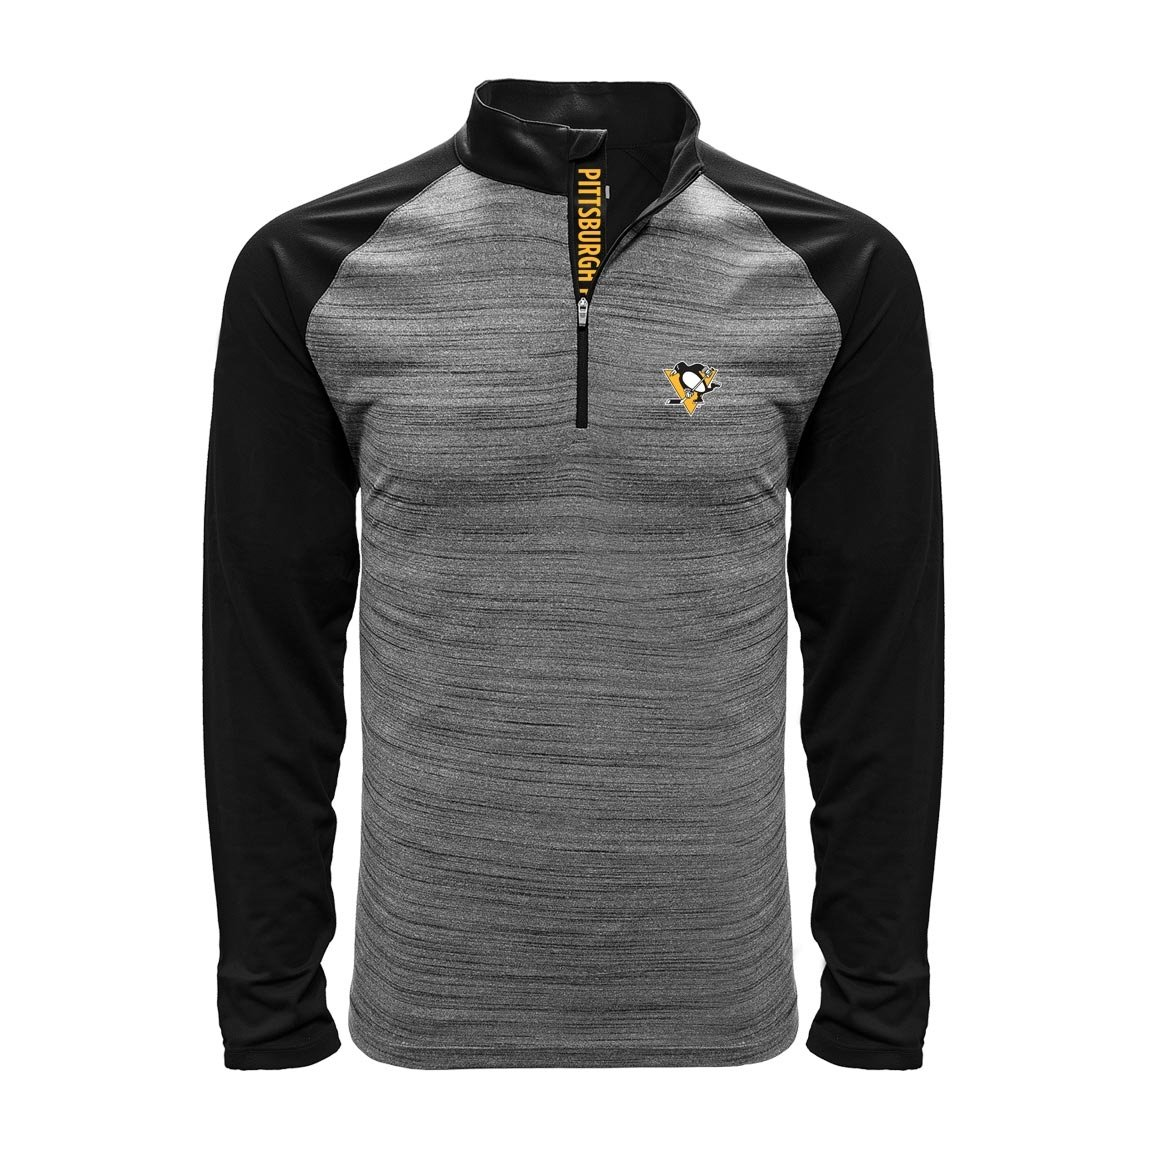 Levelwear Pittsburgh Penguins Vandal 1/4 Zip NHL Shirt